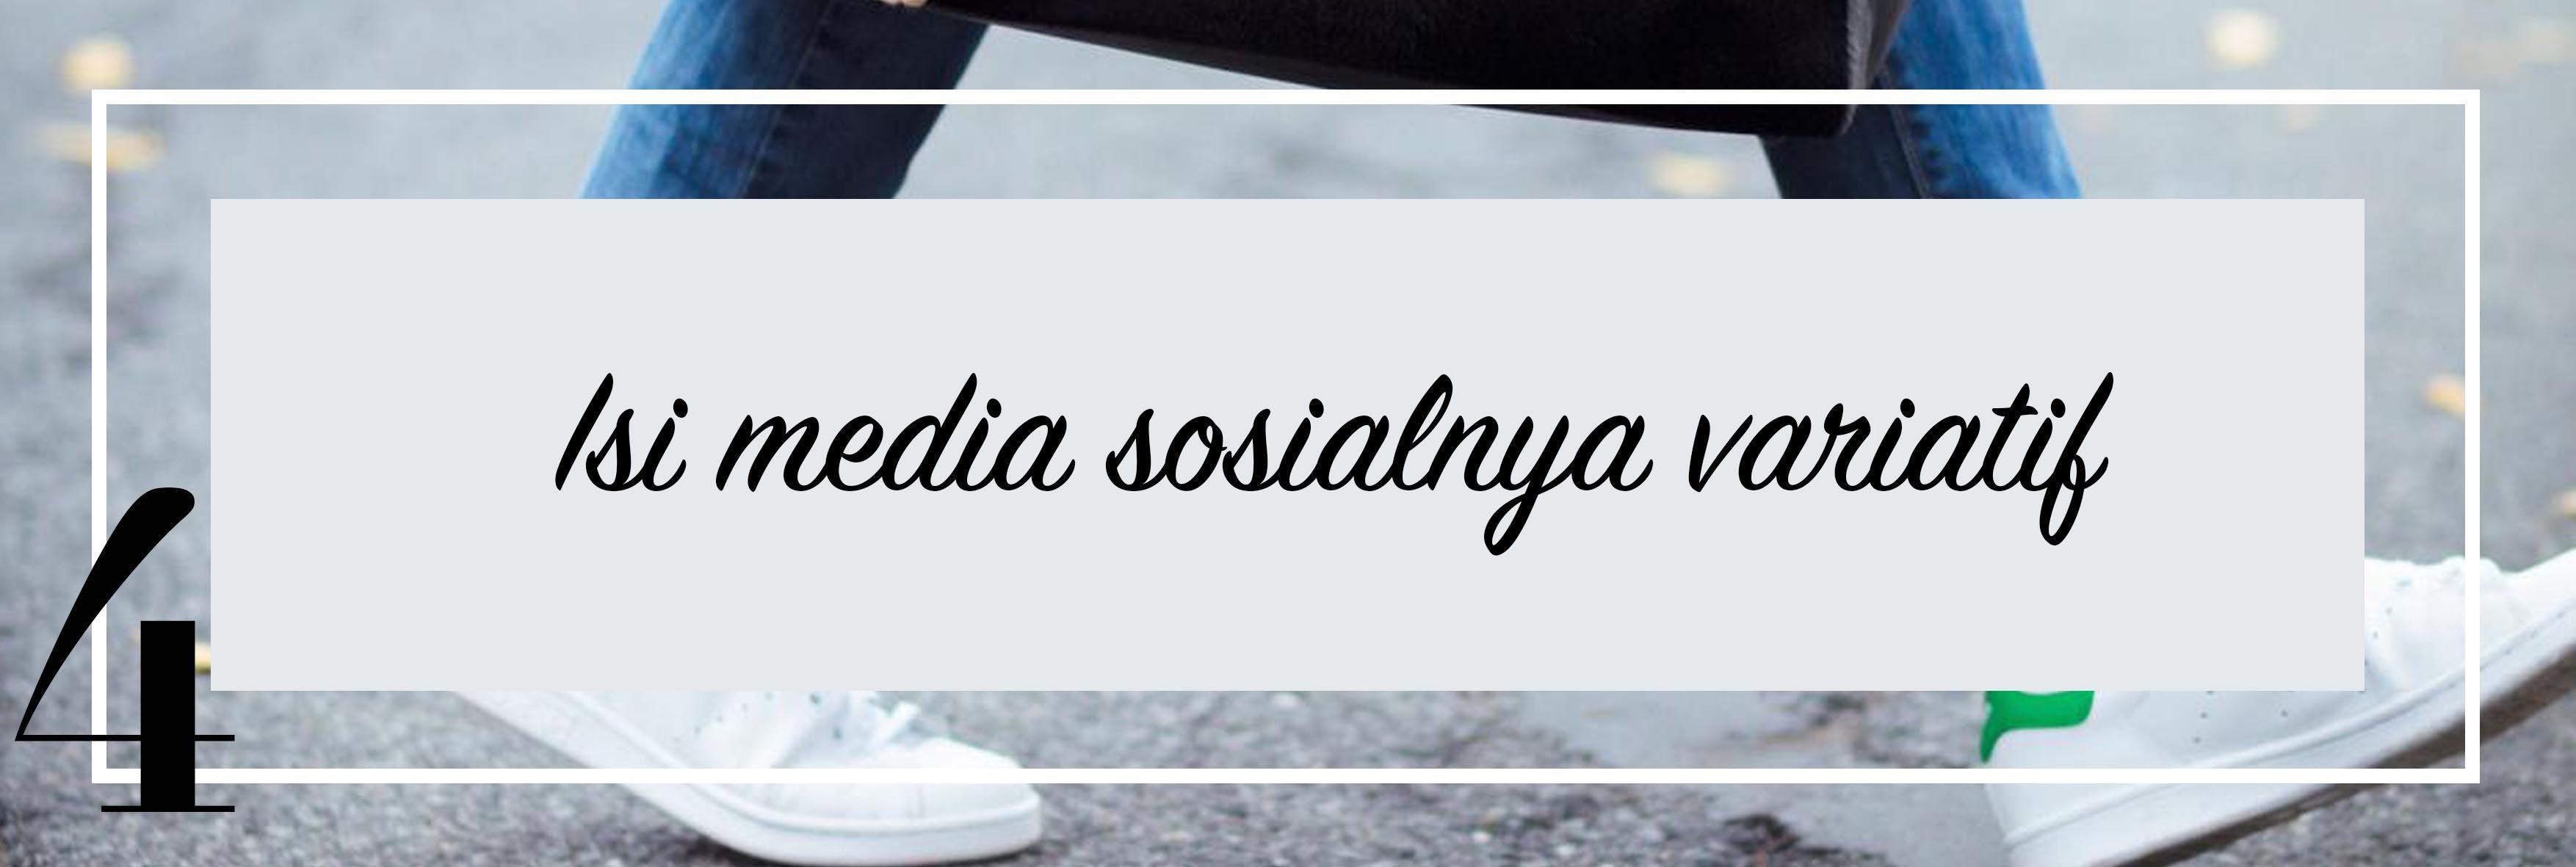 Pasangan yang Bahagia Akan Punya 6 Kebiasaan Ini di Media Sosial